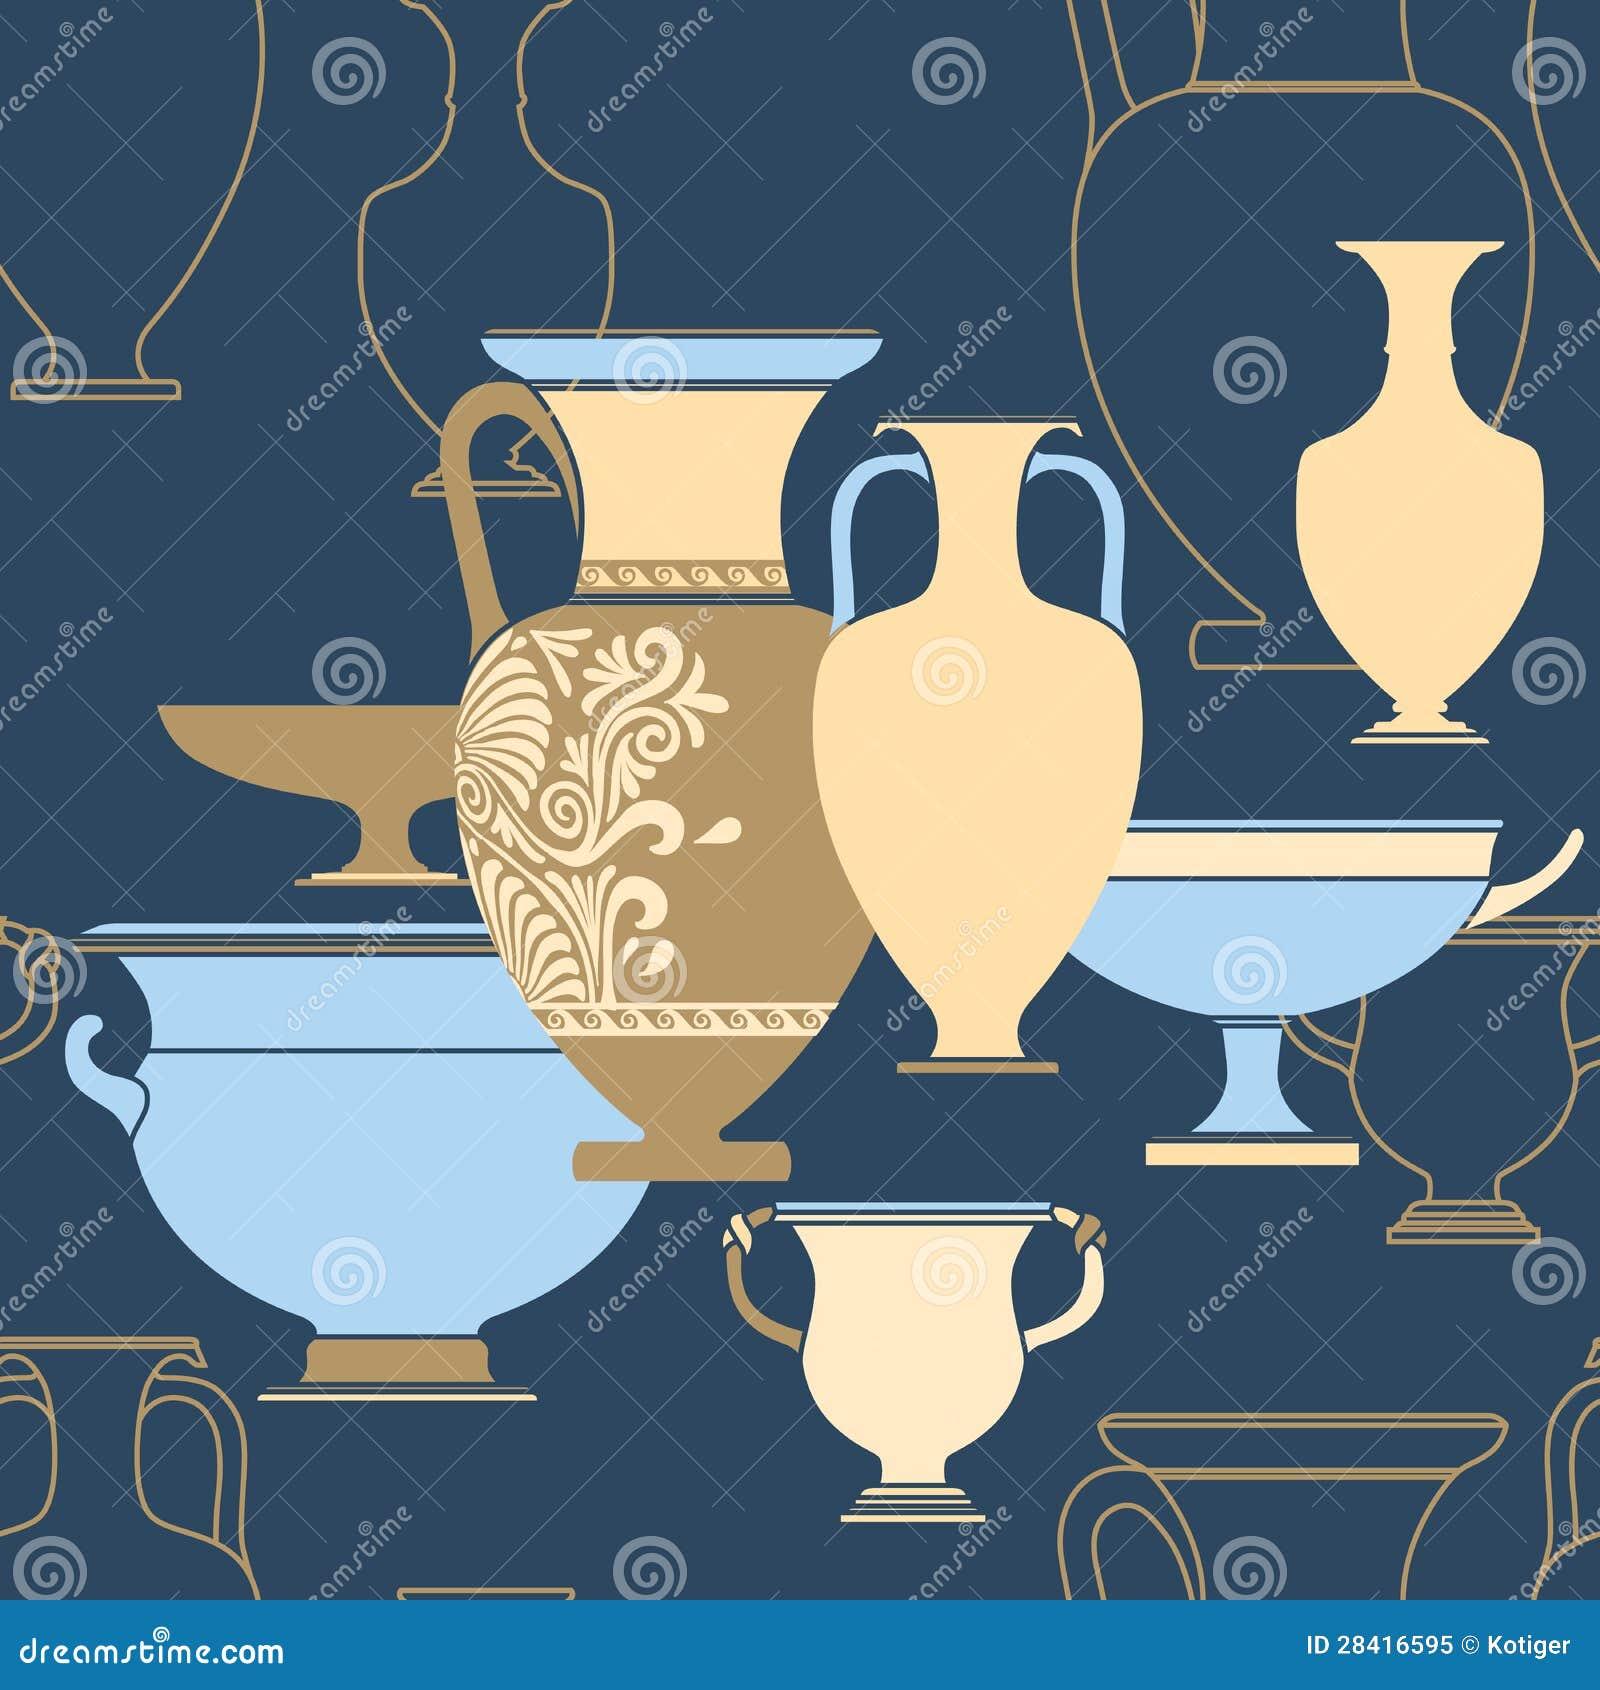 Ethnic National: Ceramic Ethnic National Greek Style Seamless Pattern